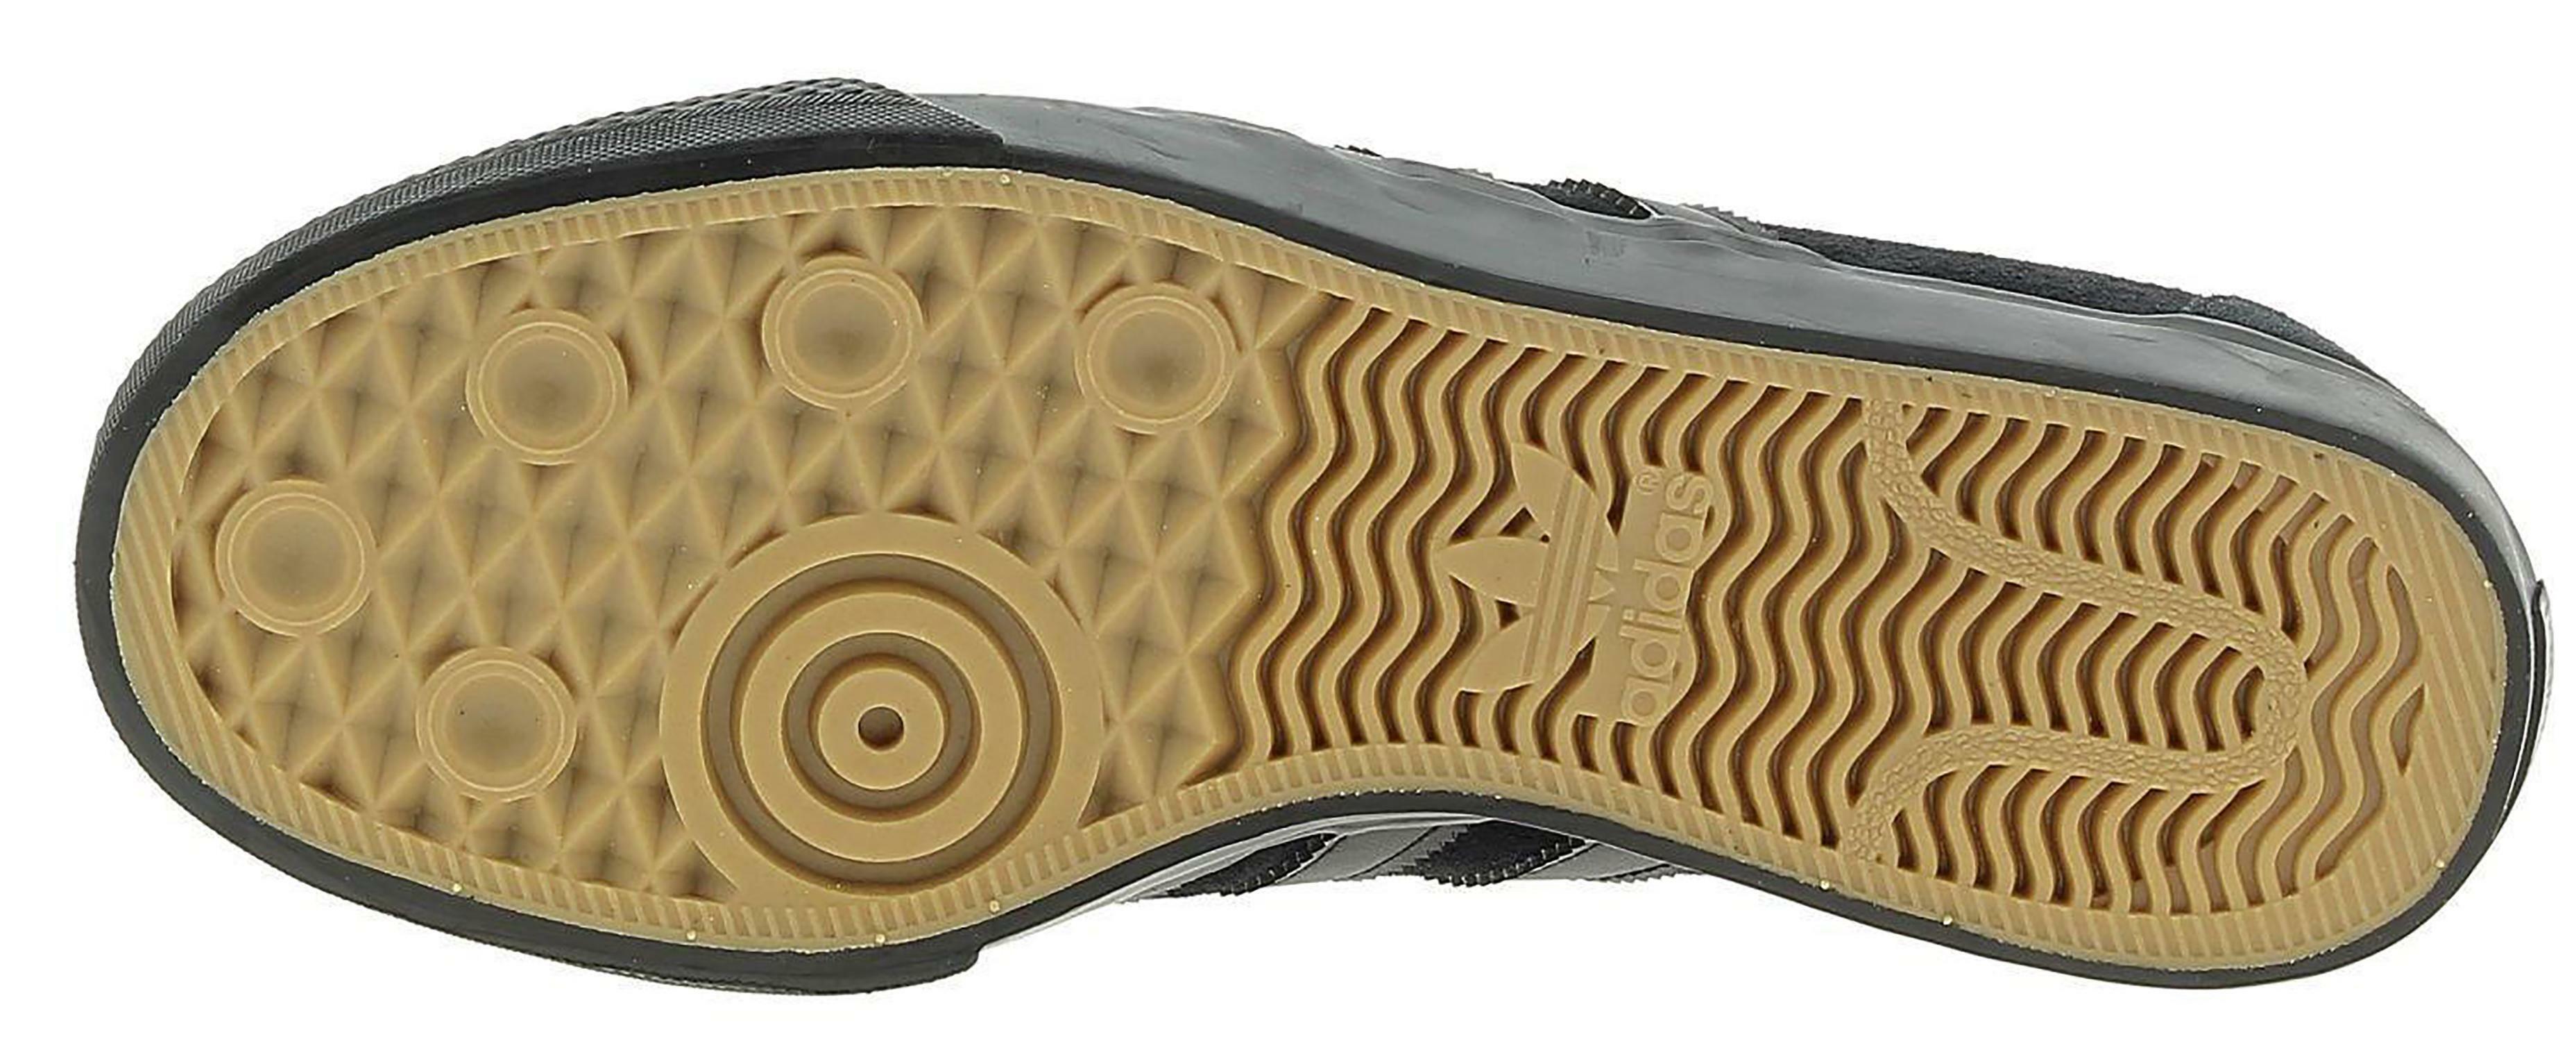 adidas adidas adi-ease scarpe sportive skate uomo nere pelle scamosciata